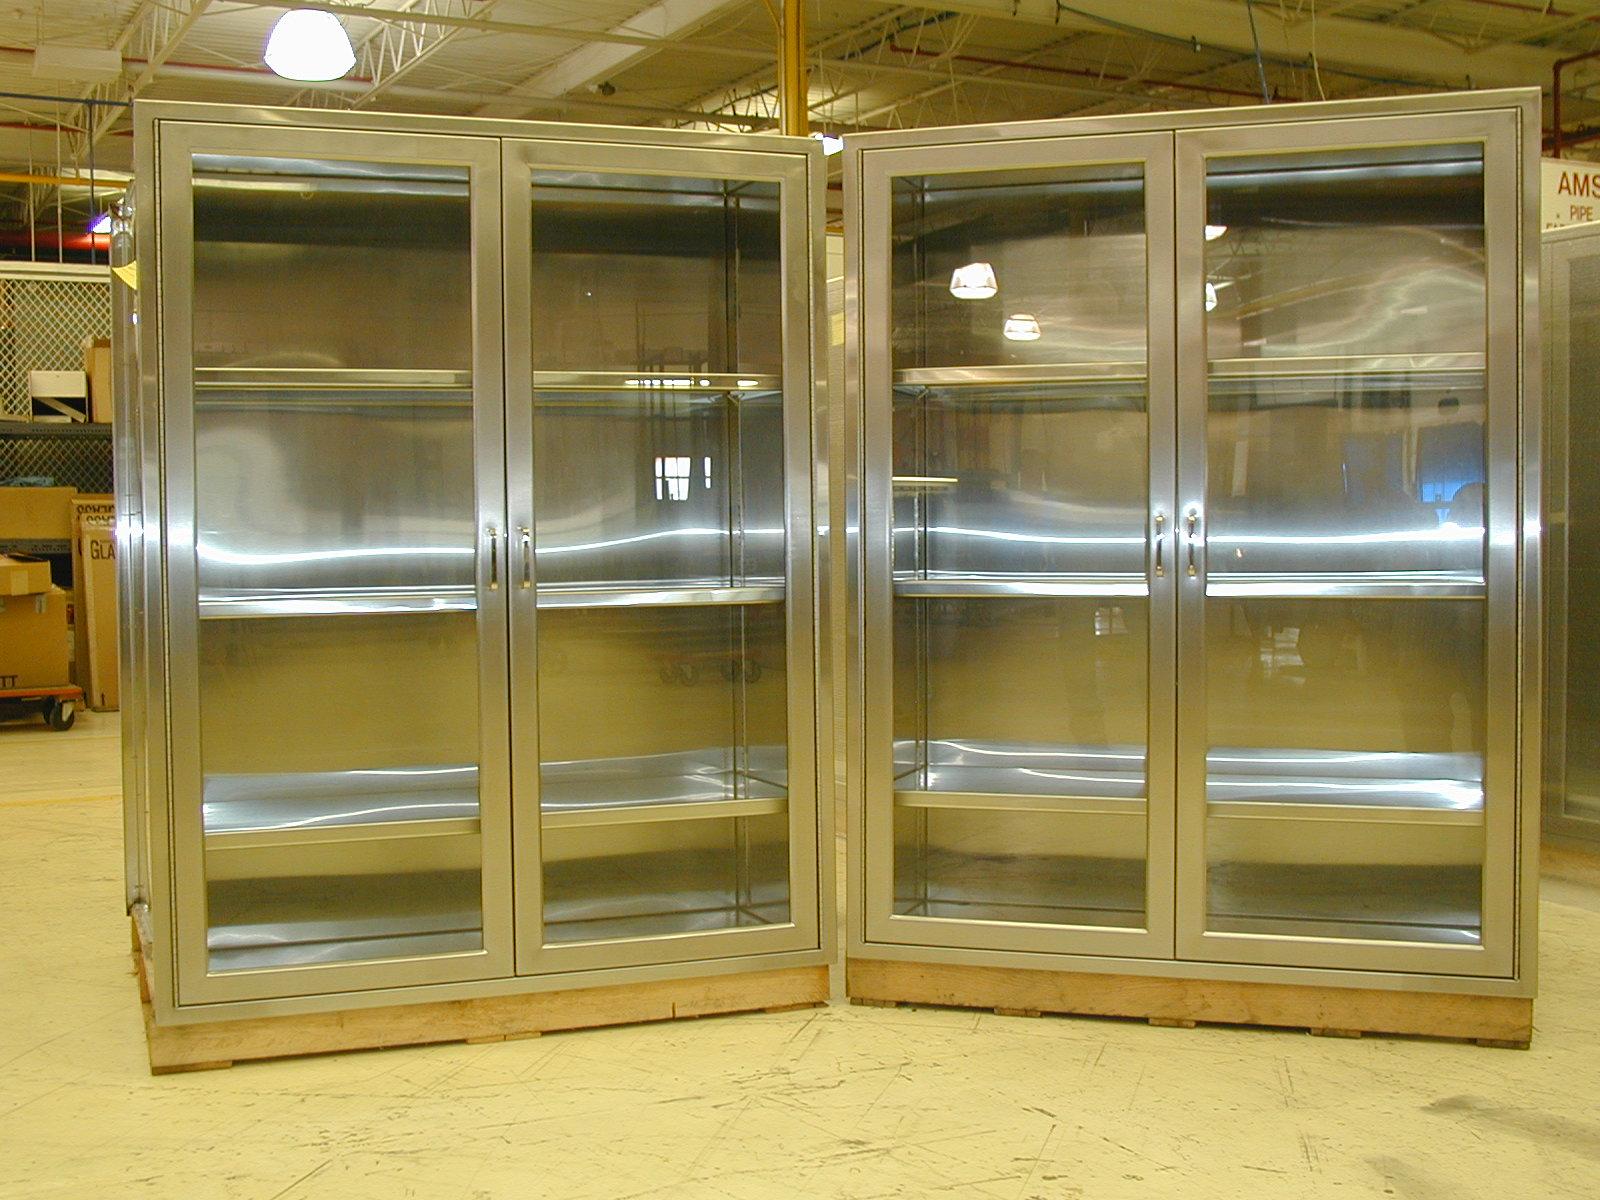 Cabinets 6.JPG